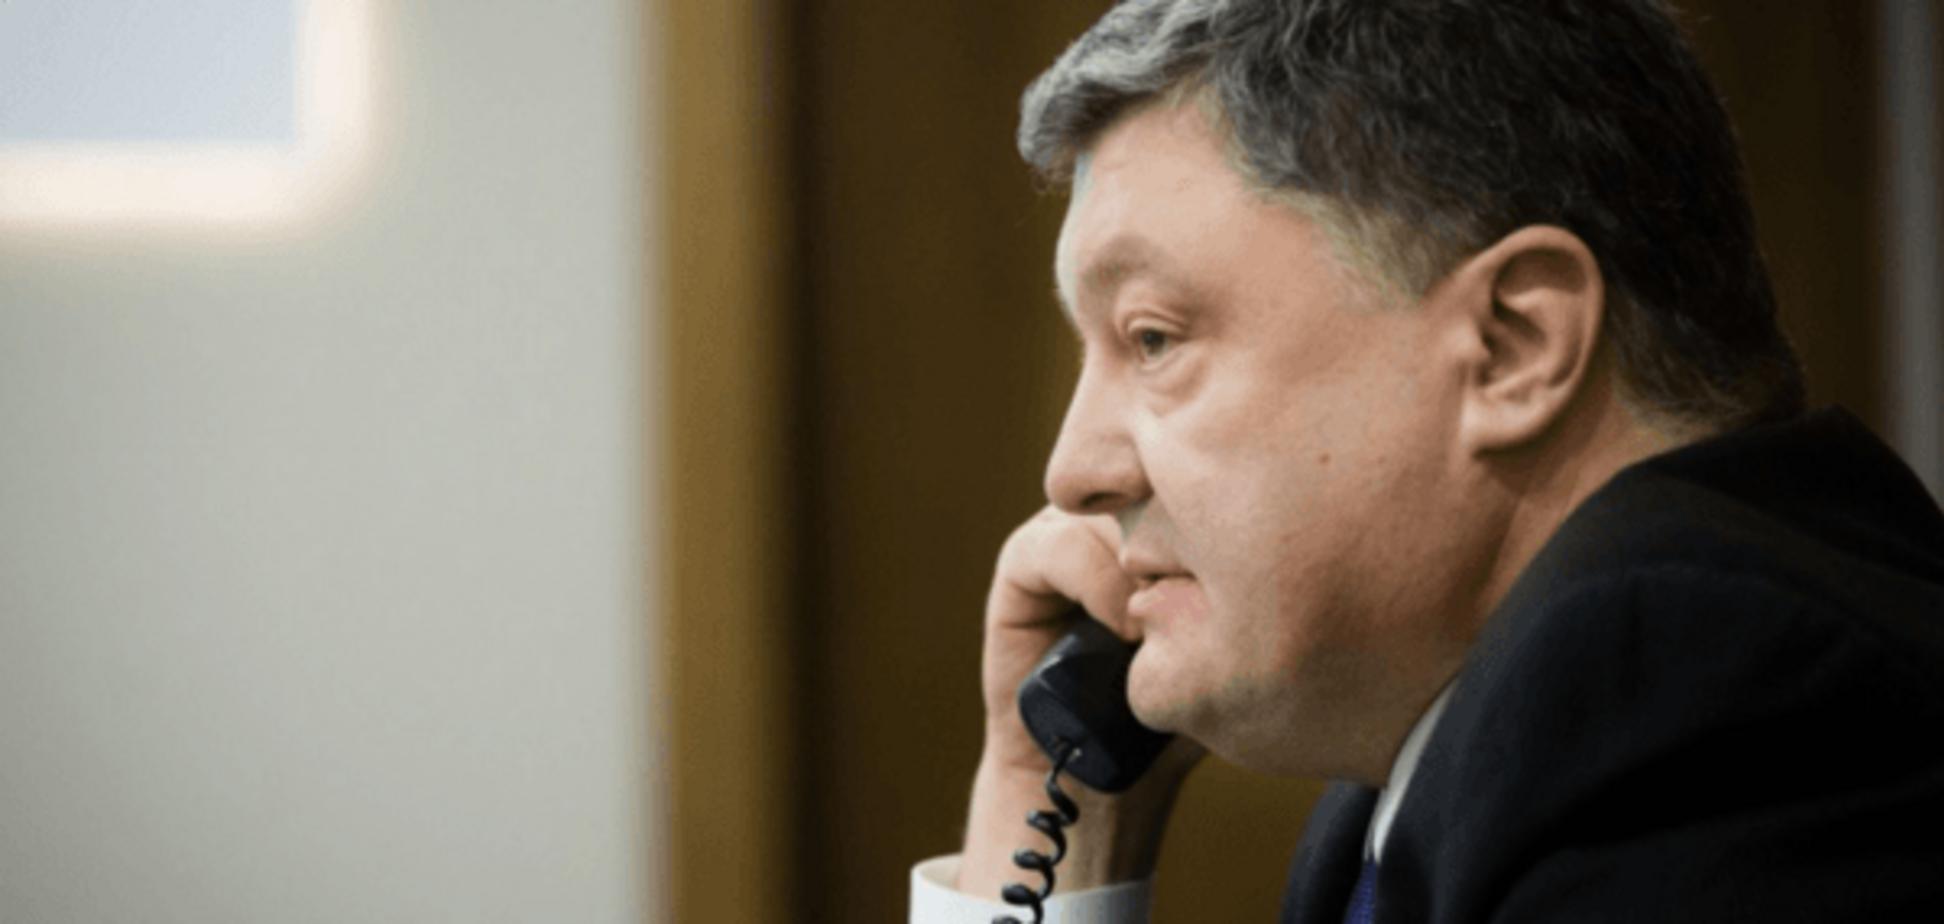 Порошенко зателефонував Савченко: 'Справедливість переможе!'